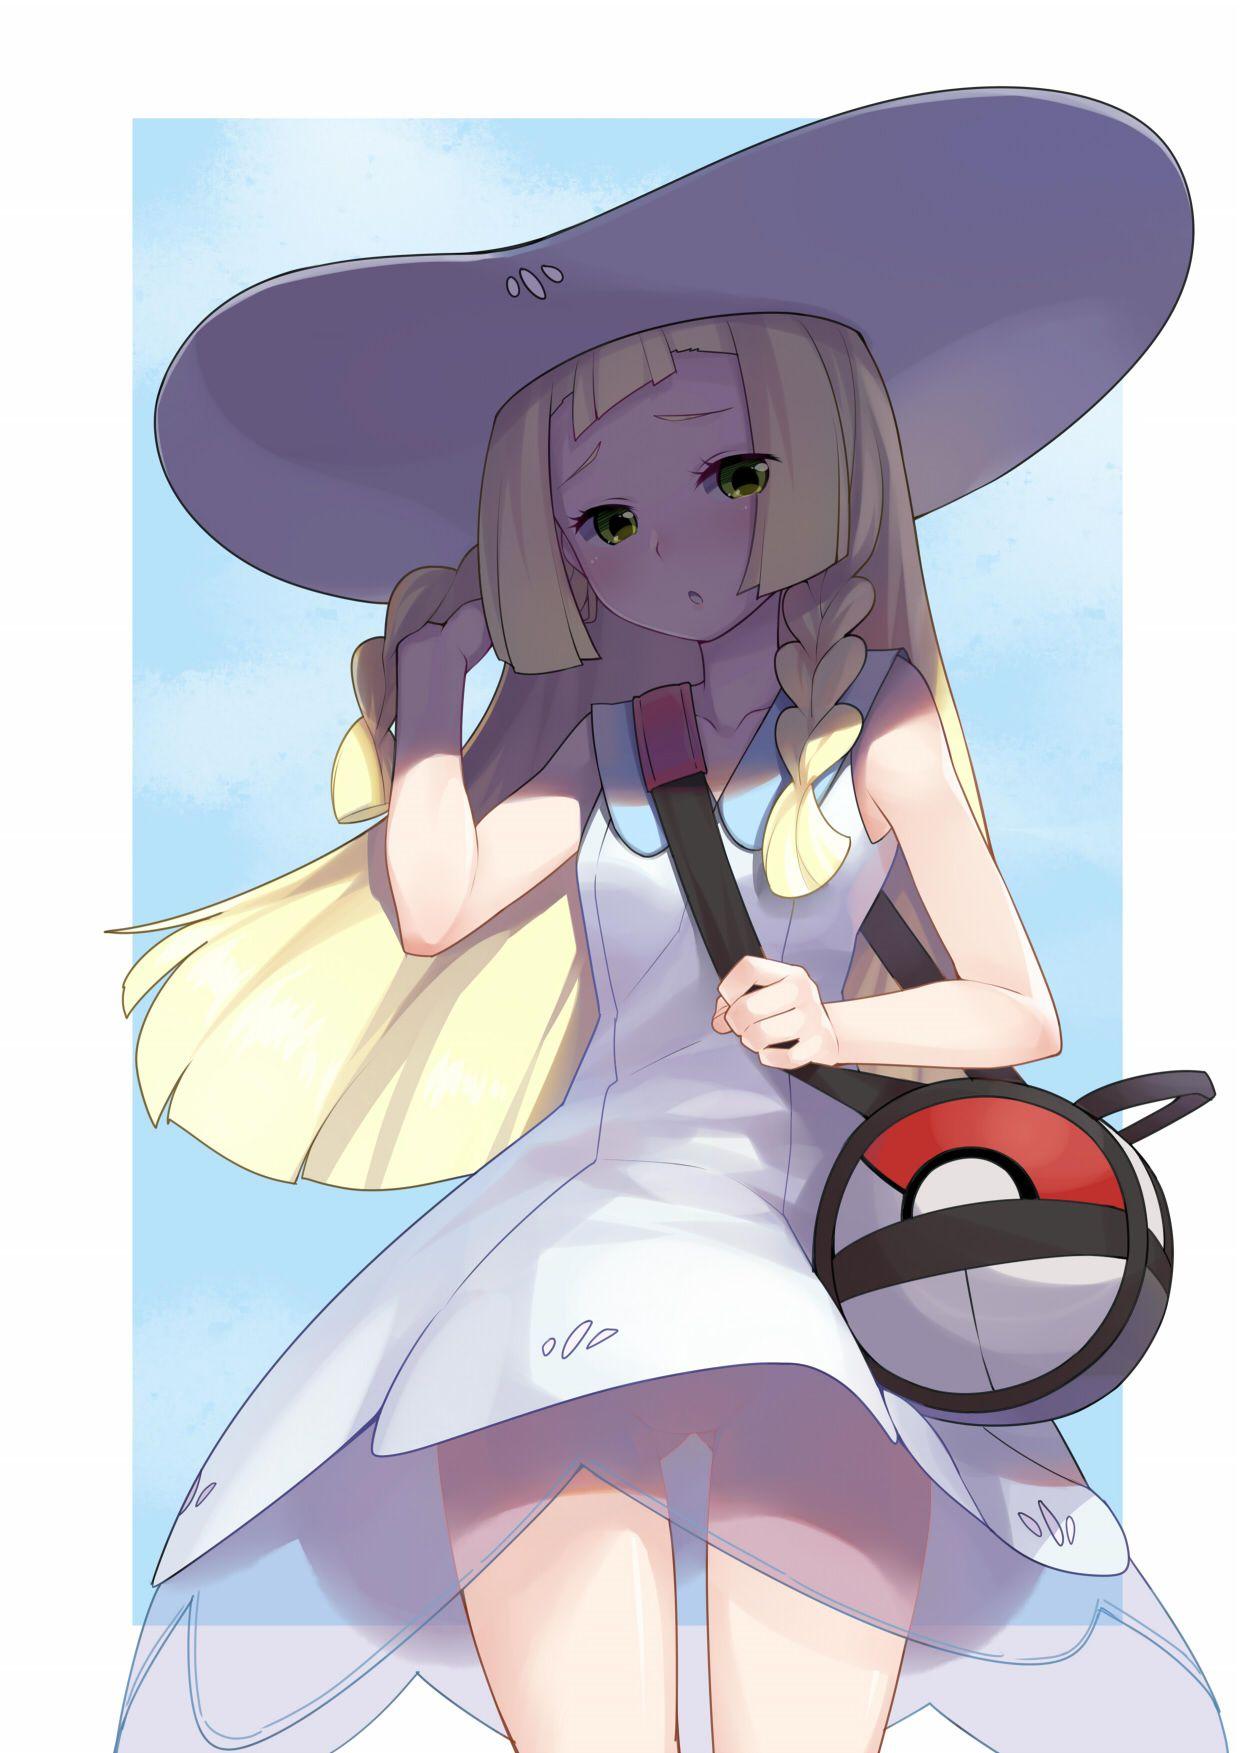 lillie_(pokemon)087